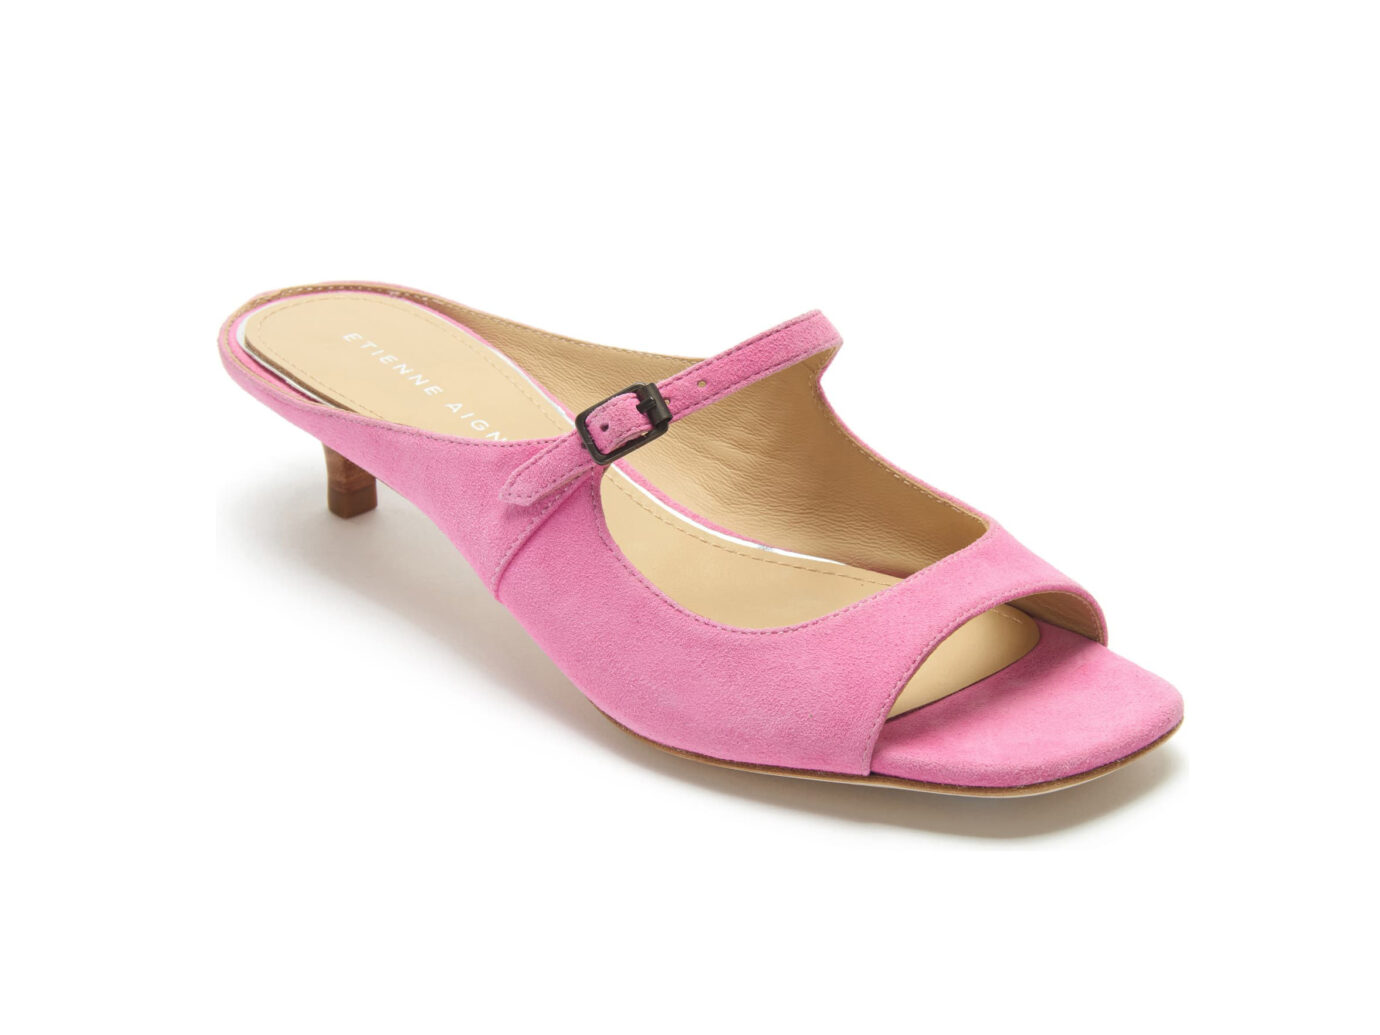 Etienne Aigner Verity Mary Jane Slip-On Sandal (Pink)